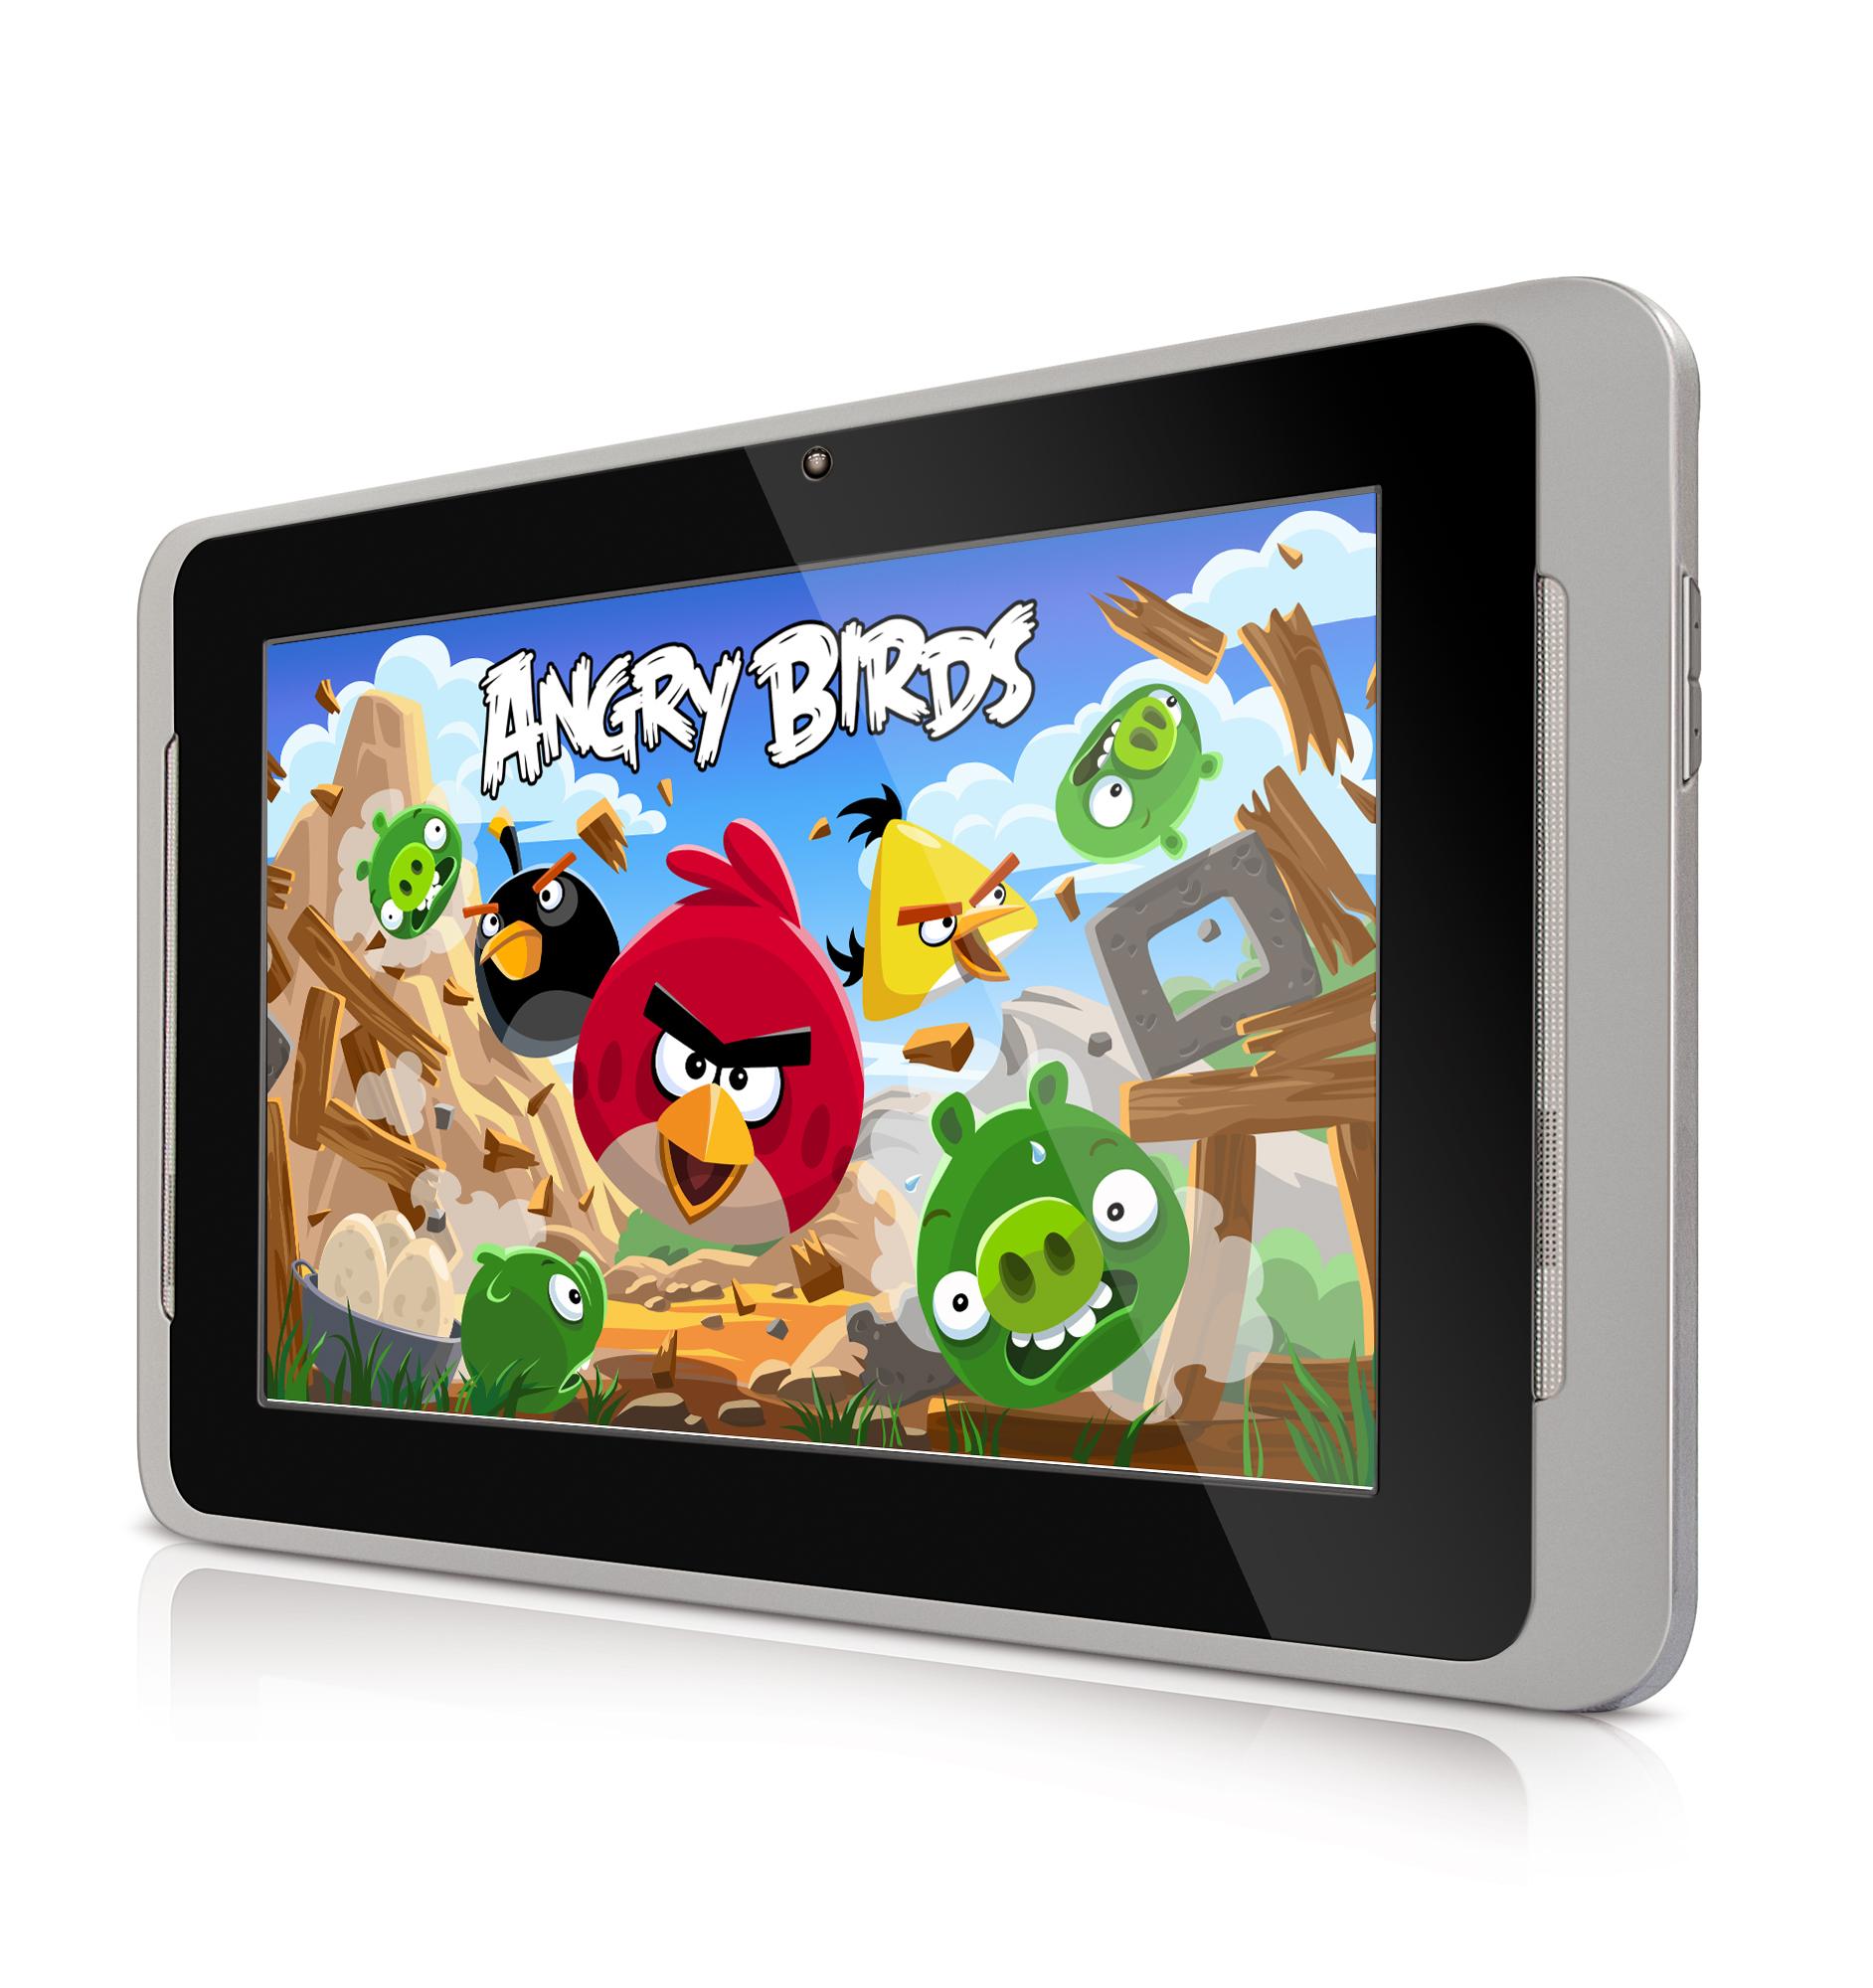 Mini PC's / tablets